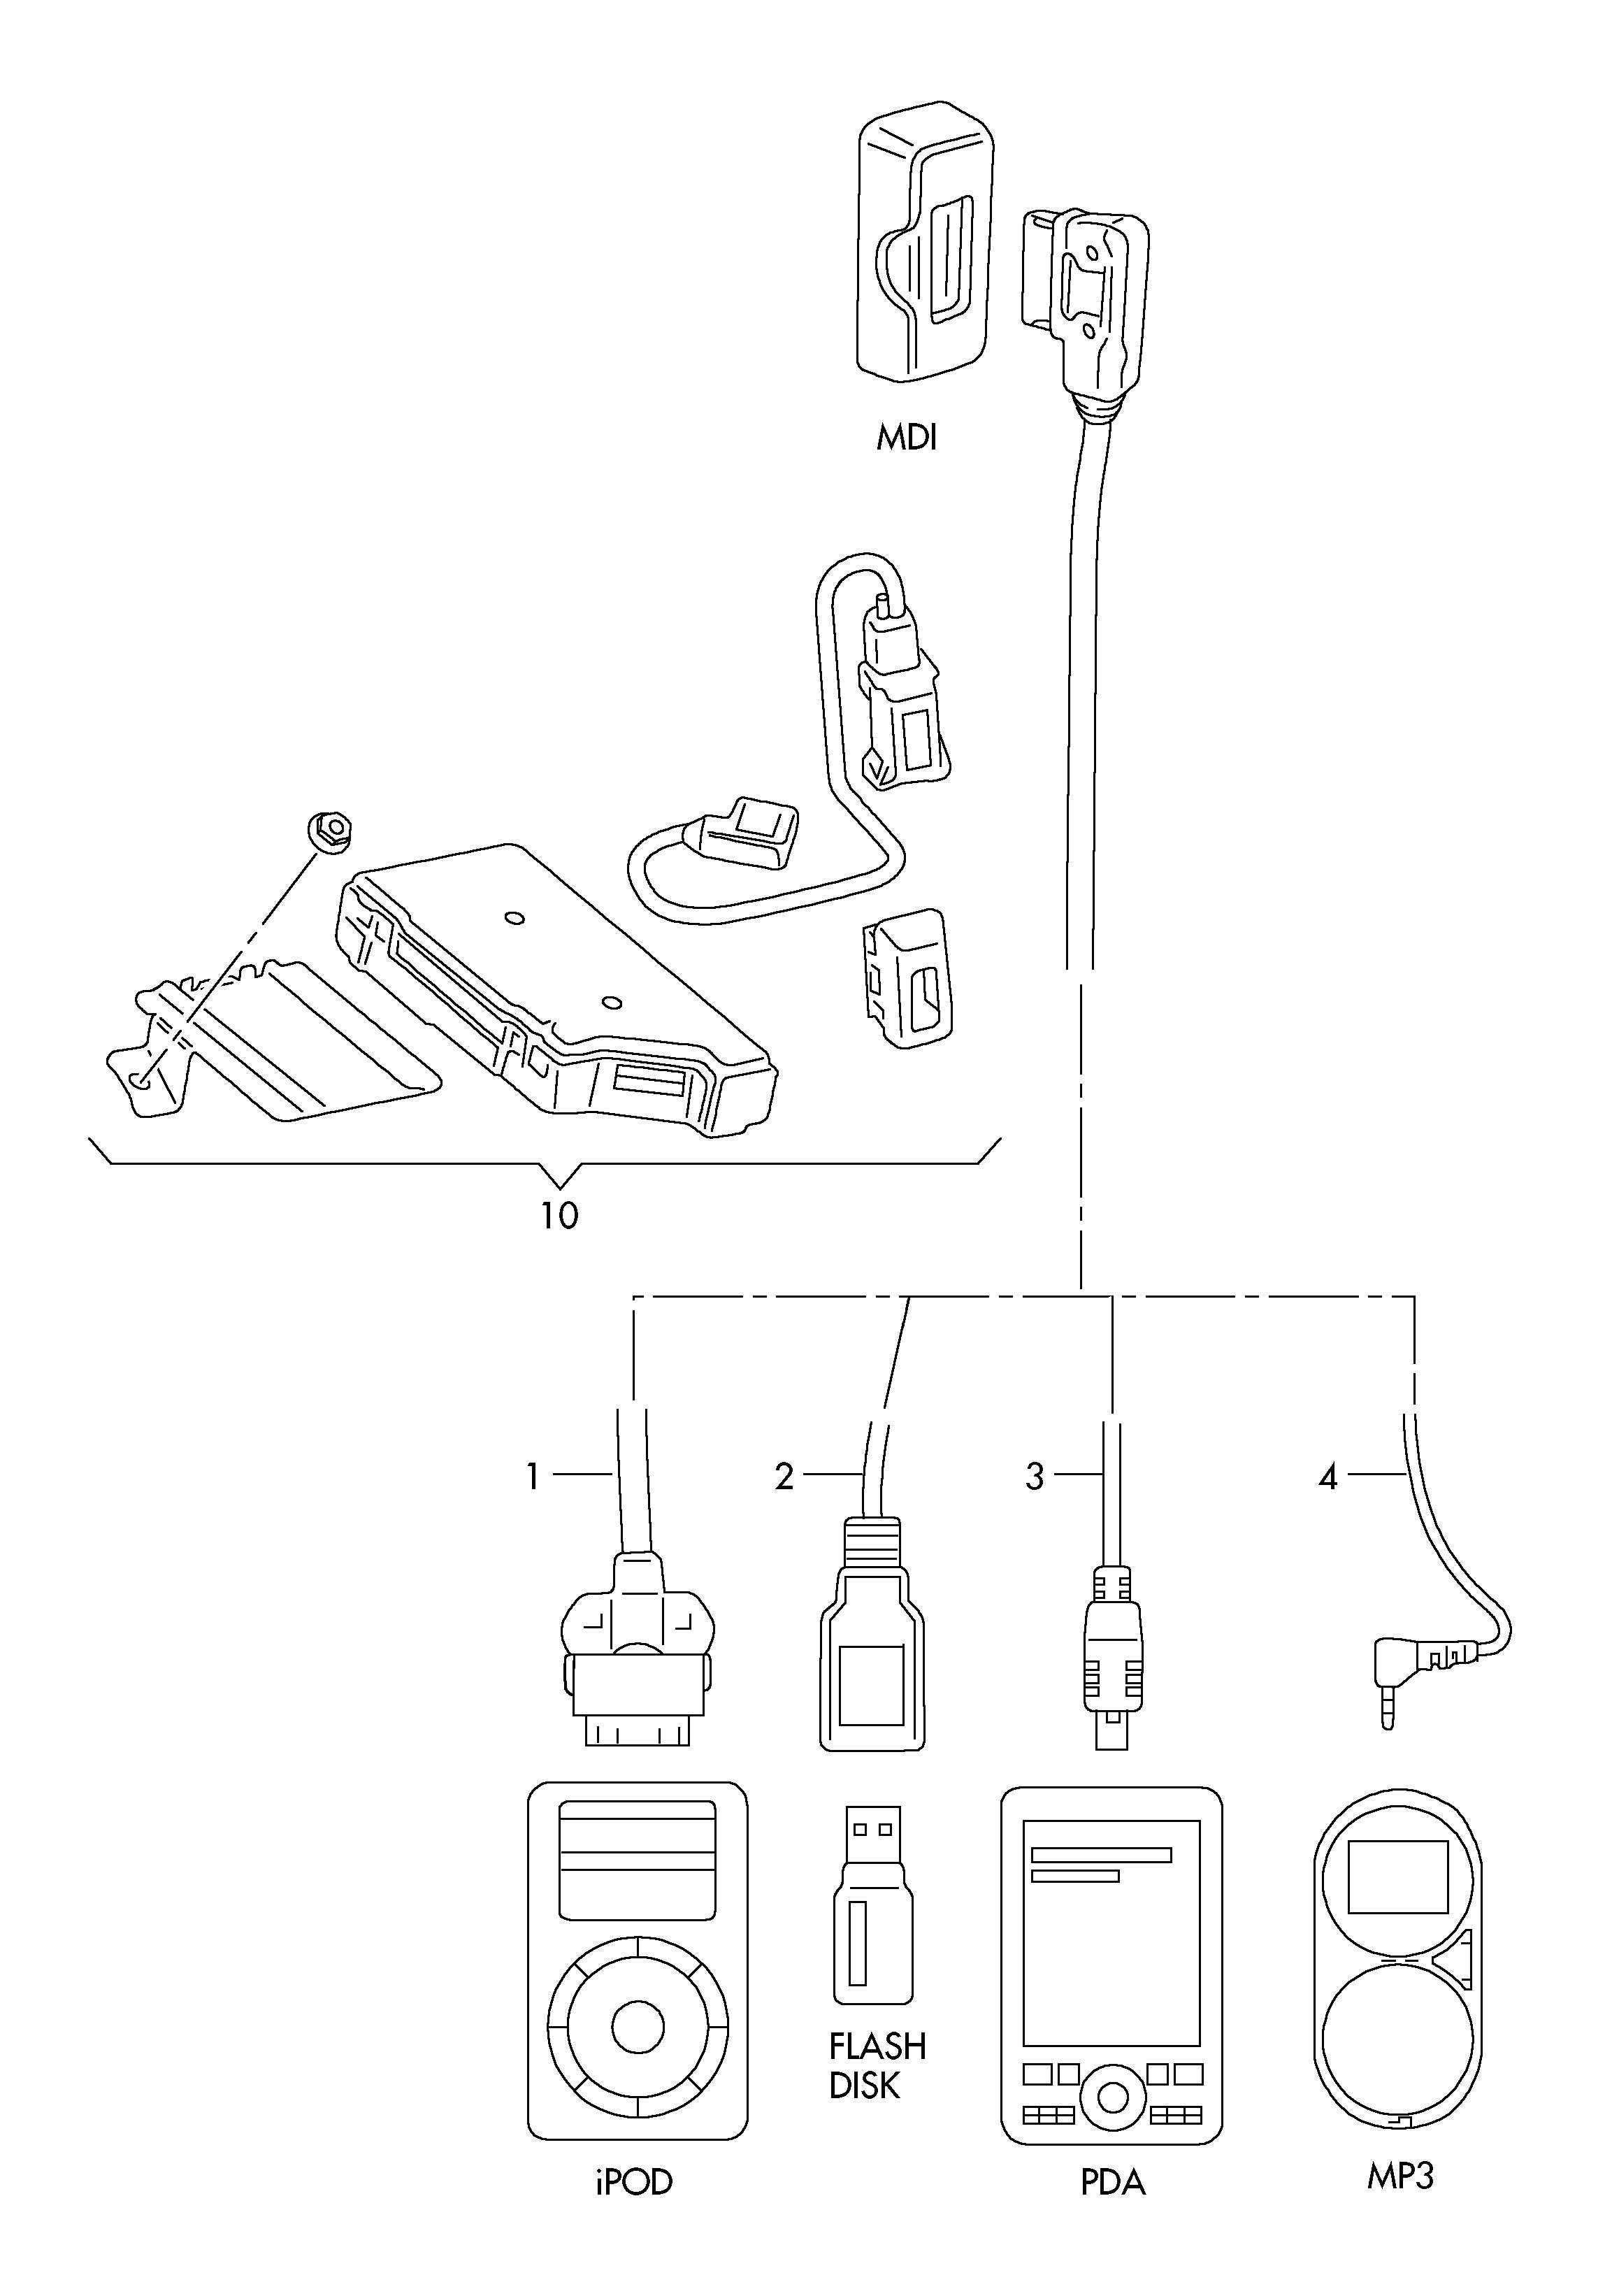 Volkswagen Jetta 2 5l 5 Cylinder Media Digital Interface